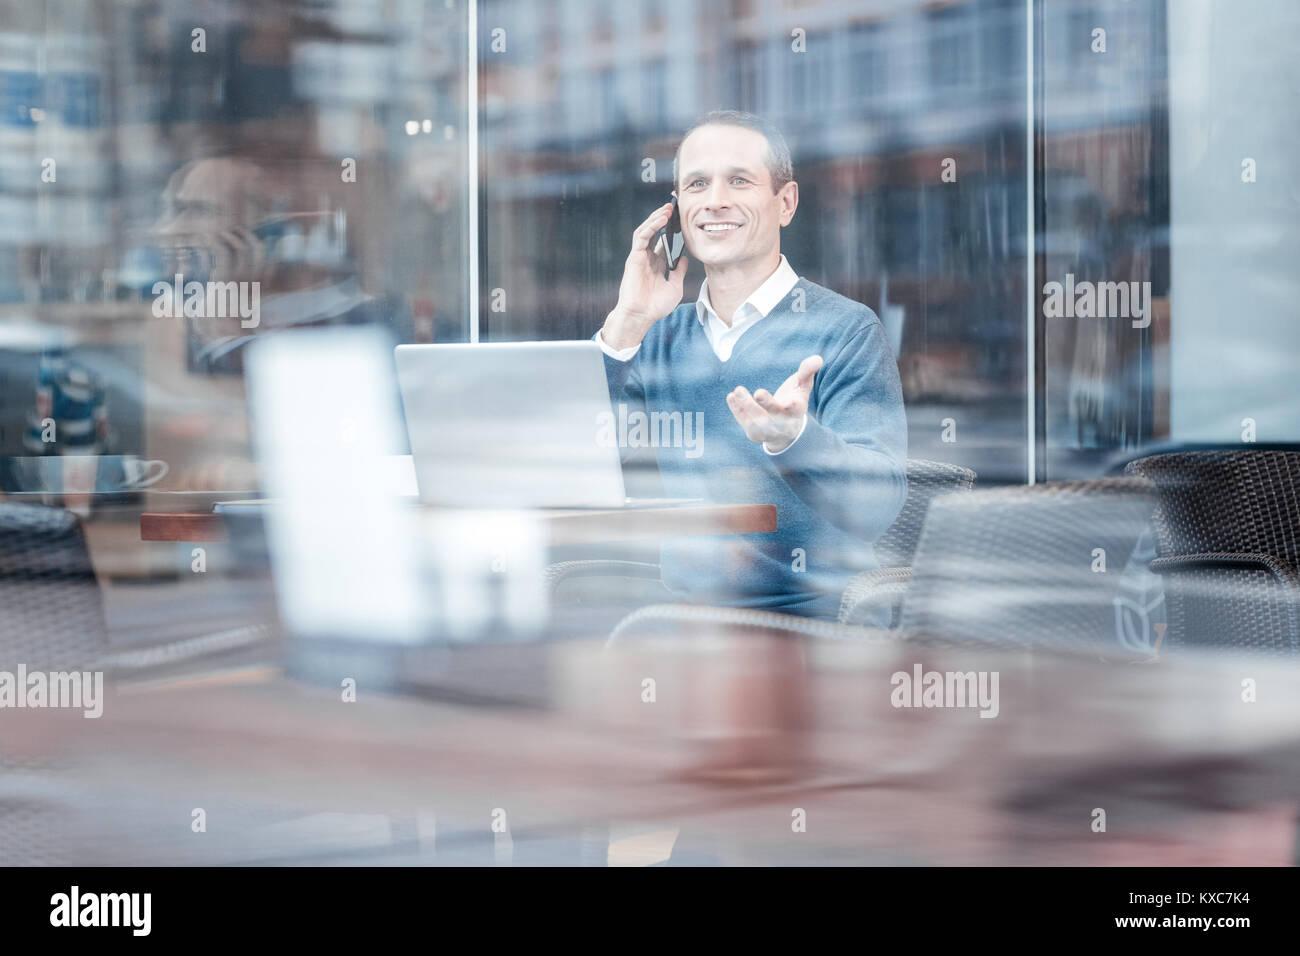 Positiv erfreut Geschäftsmann in Telefon sprechen Stockbild